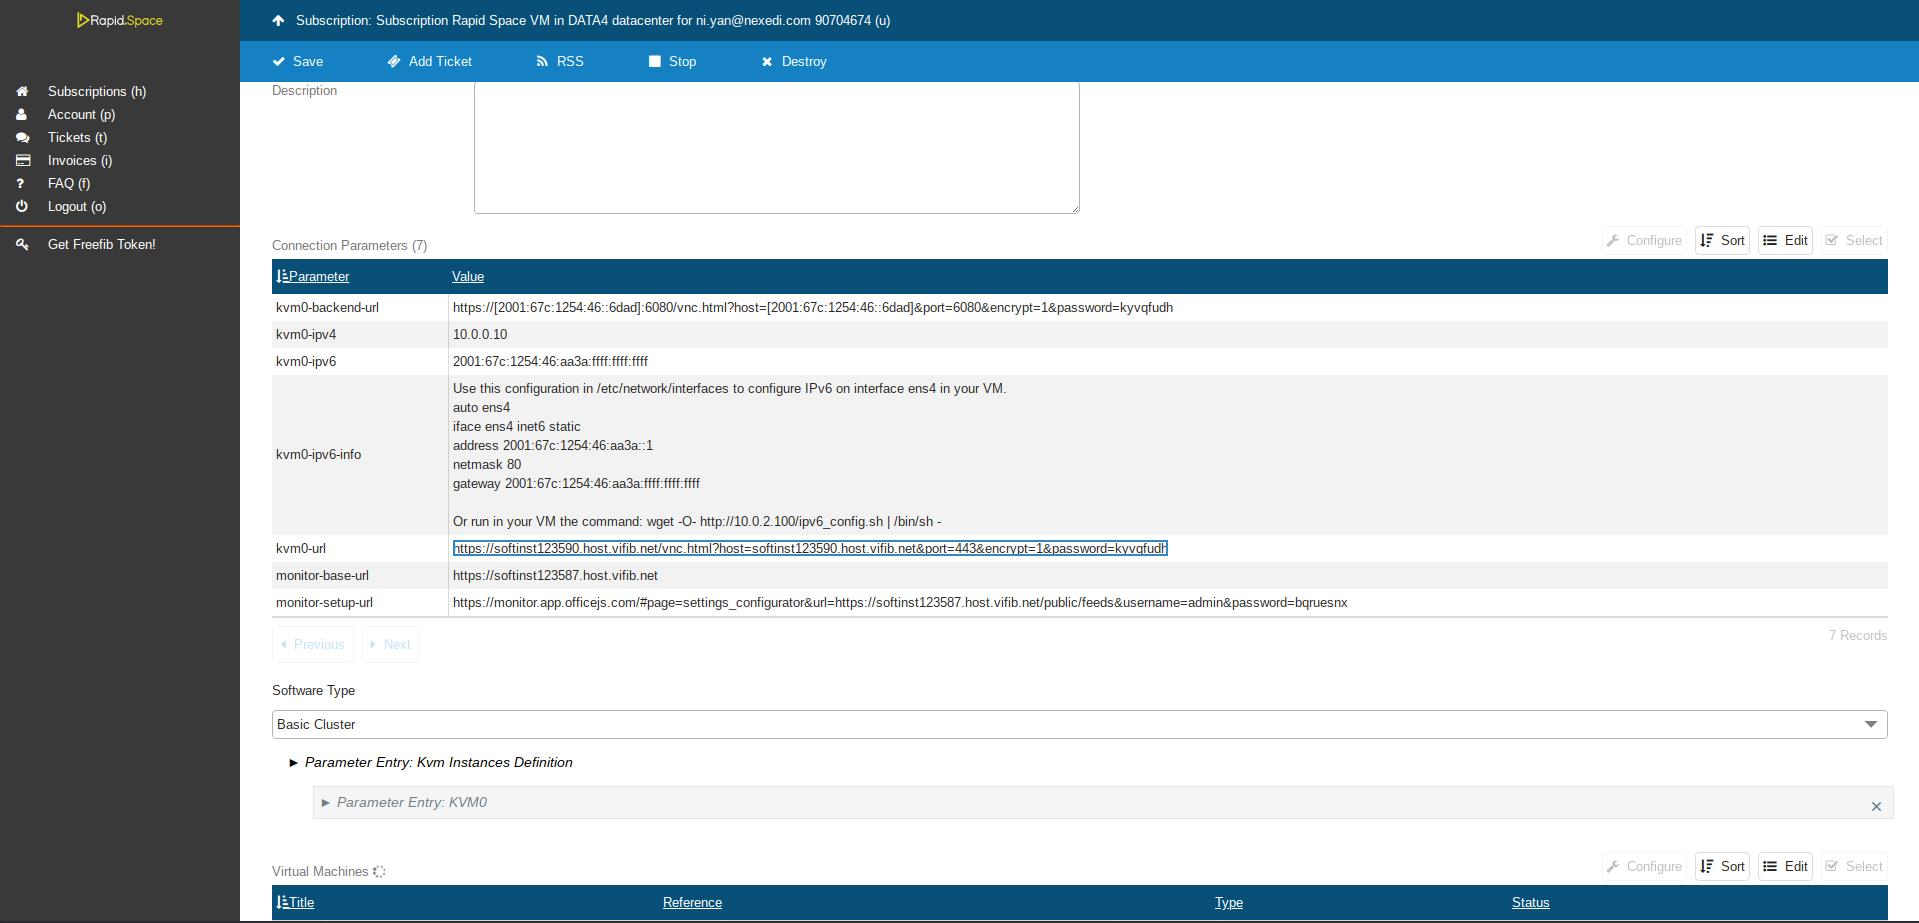 Rapid Space Console_kvm-url Screenshot